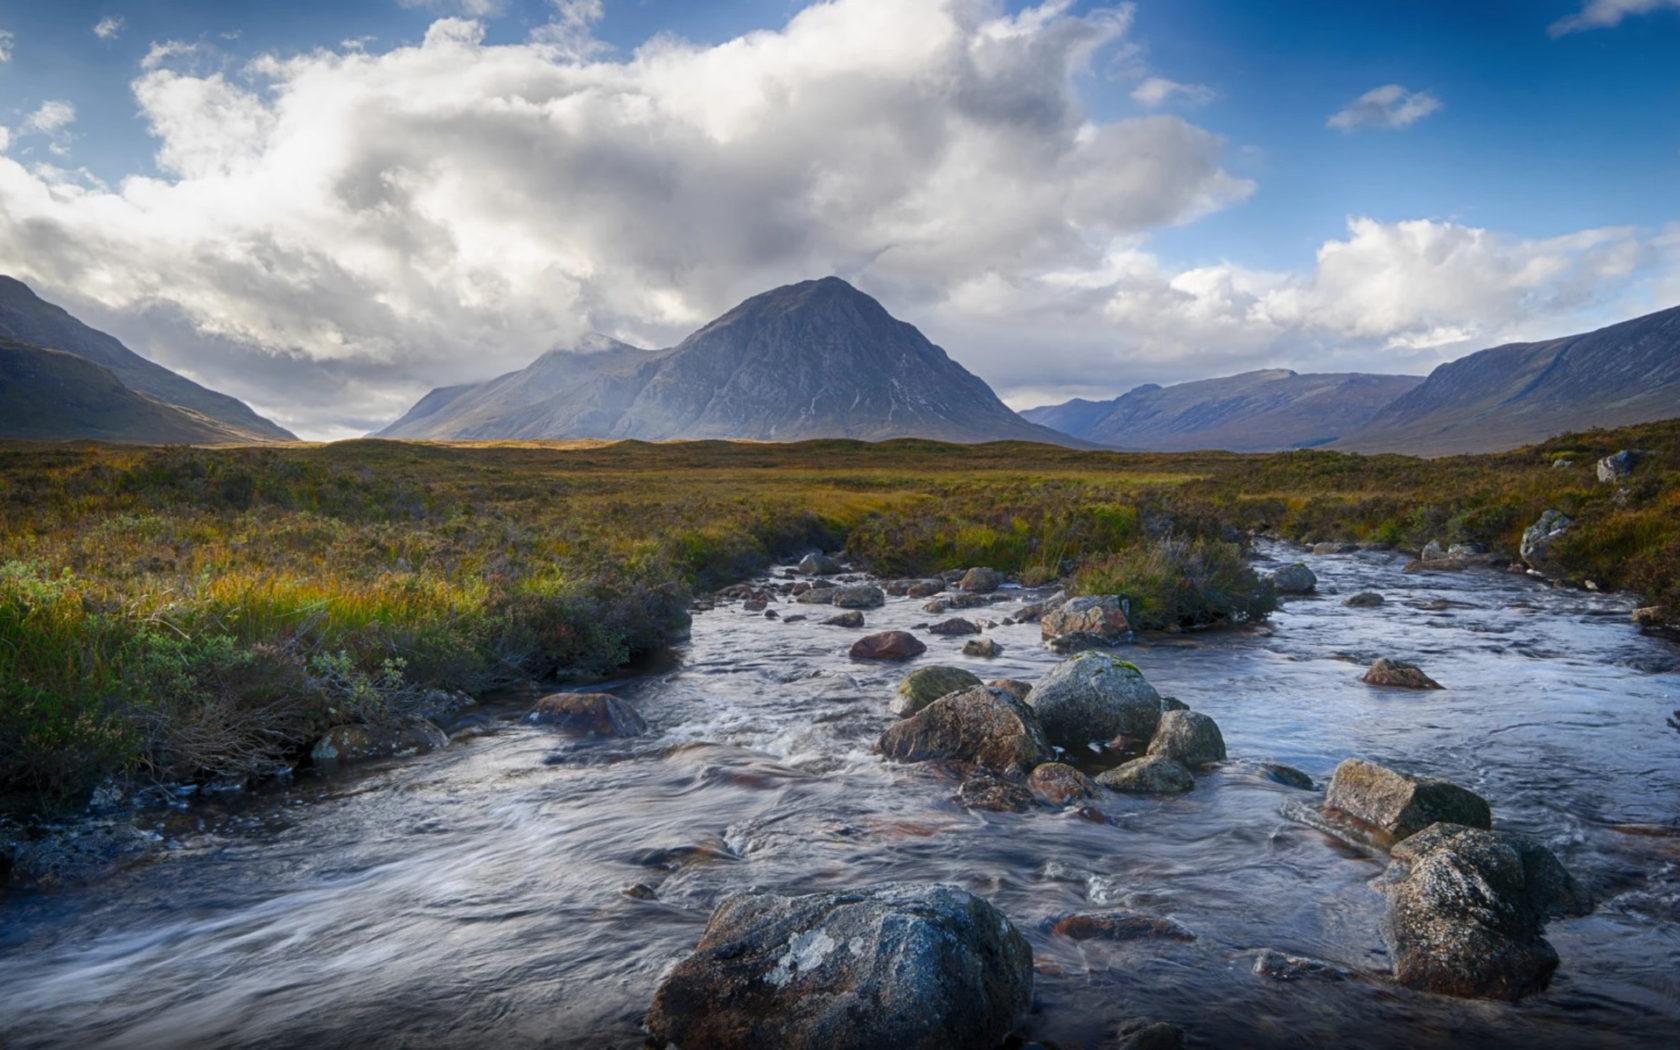 Fall Colors Wallpaper 1920x1080 Glen Coe Mountain In Scotland Of Volcanic Origin In The